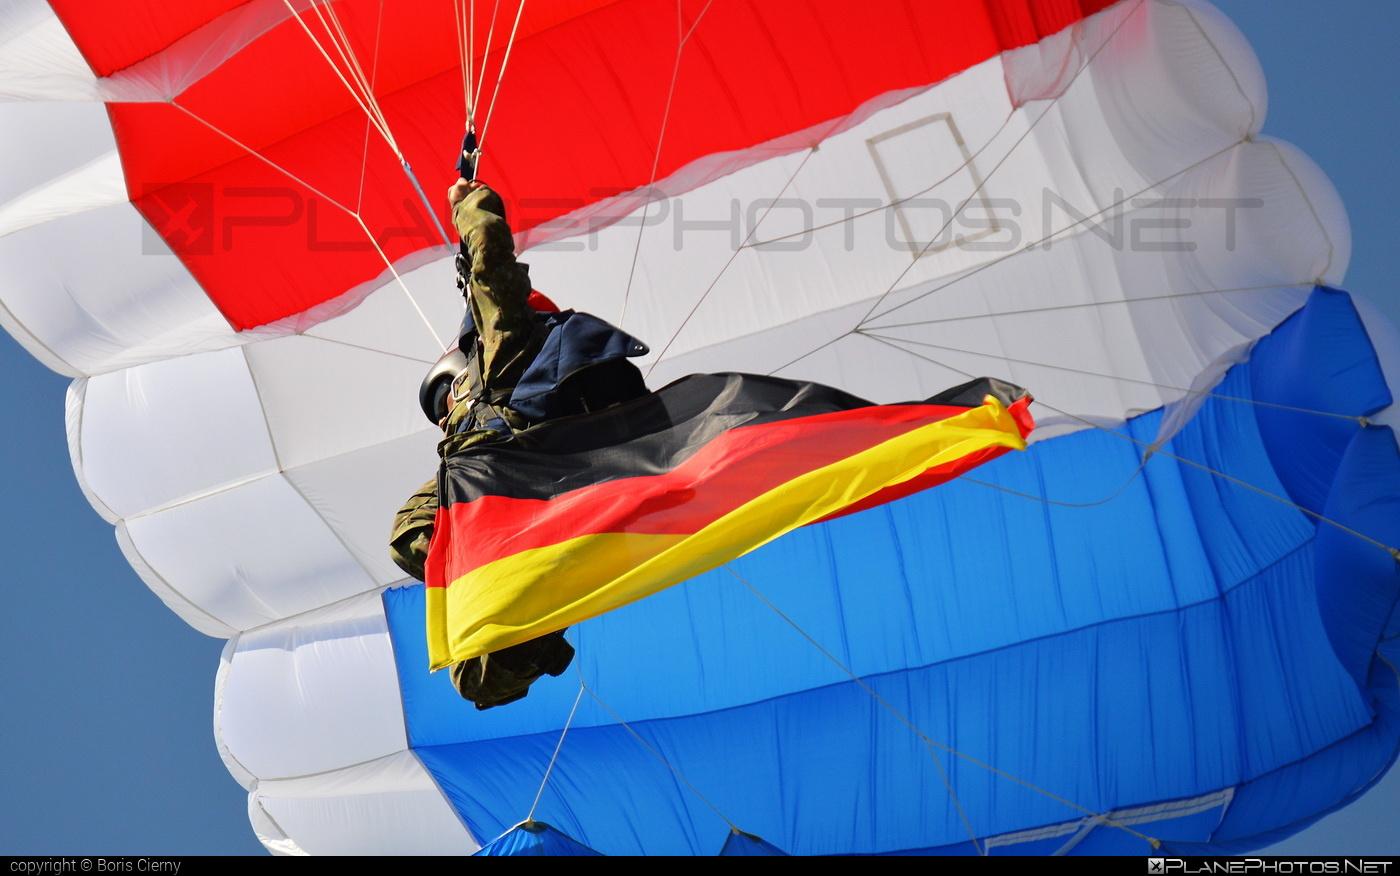 Parachute - No registration operated by Ozbrojené sily Slovenskej republiky (Slovak Armed Forces) #ossr #ozbrojenesilysr #slovakarmedforces